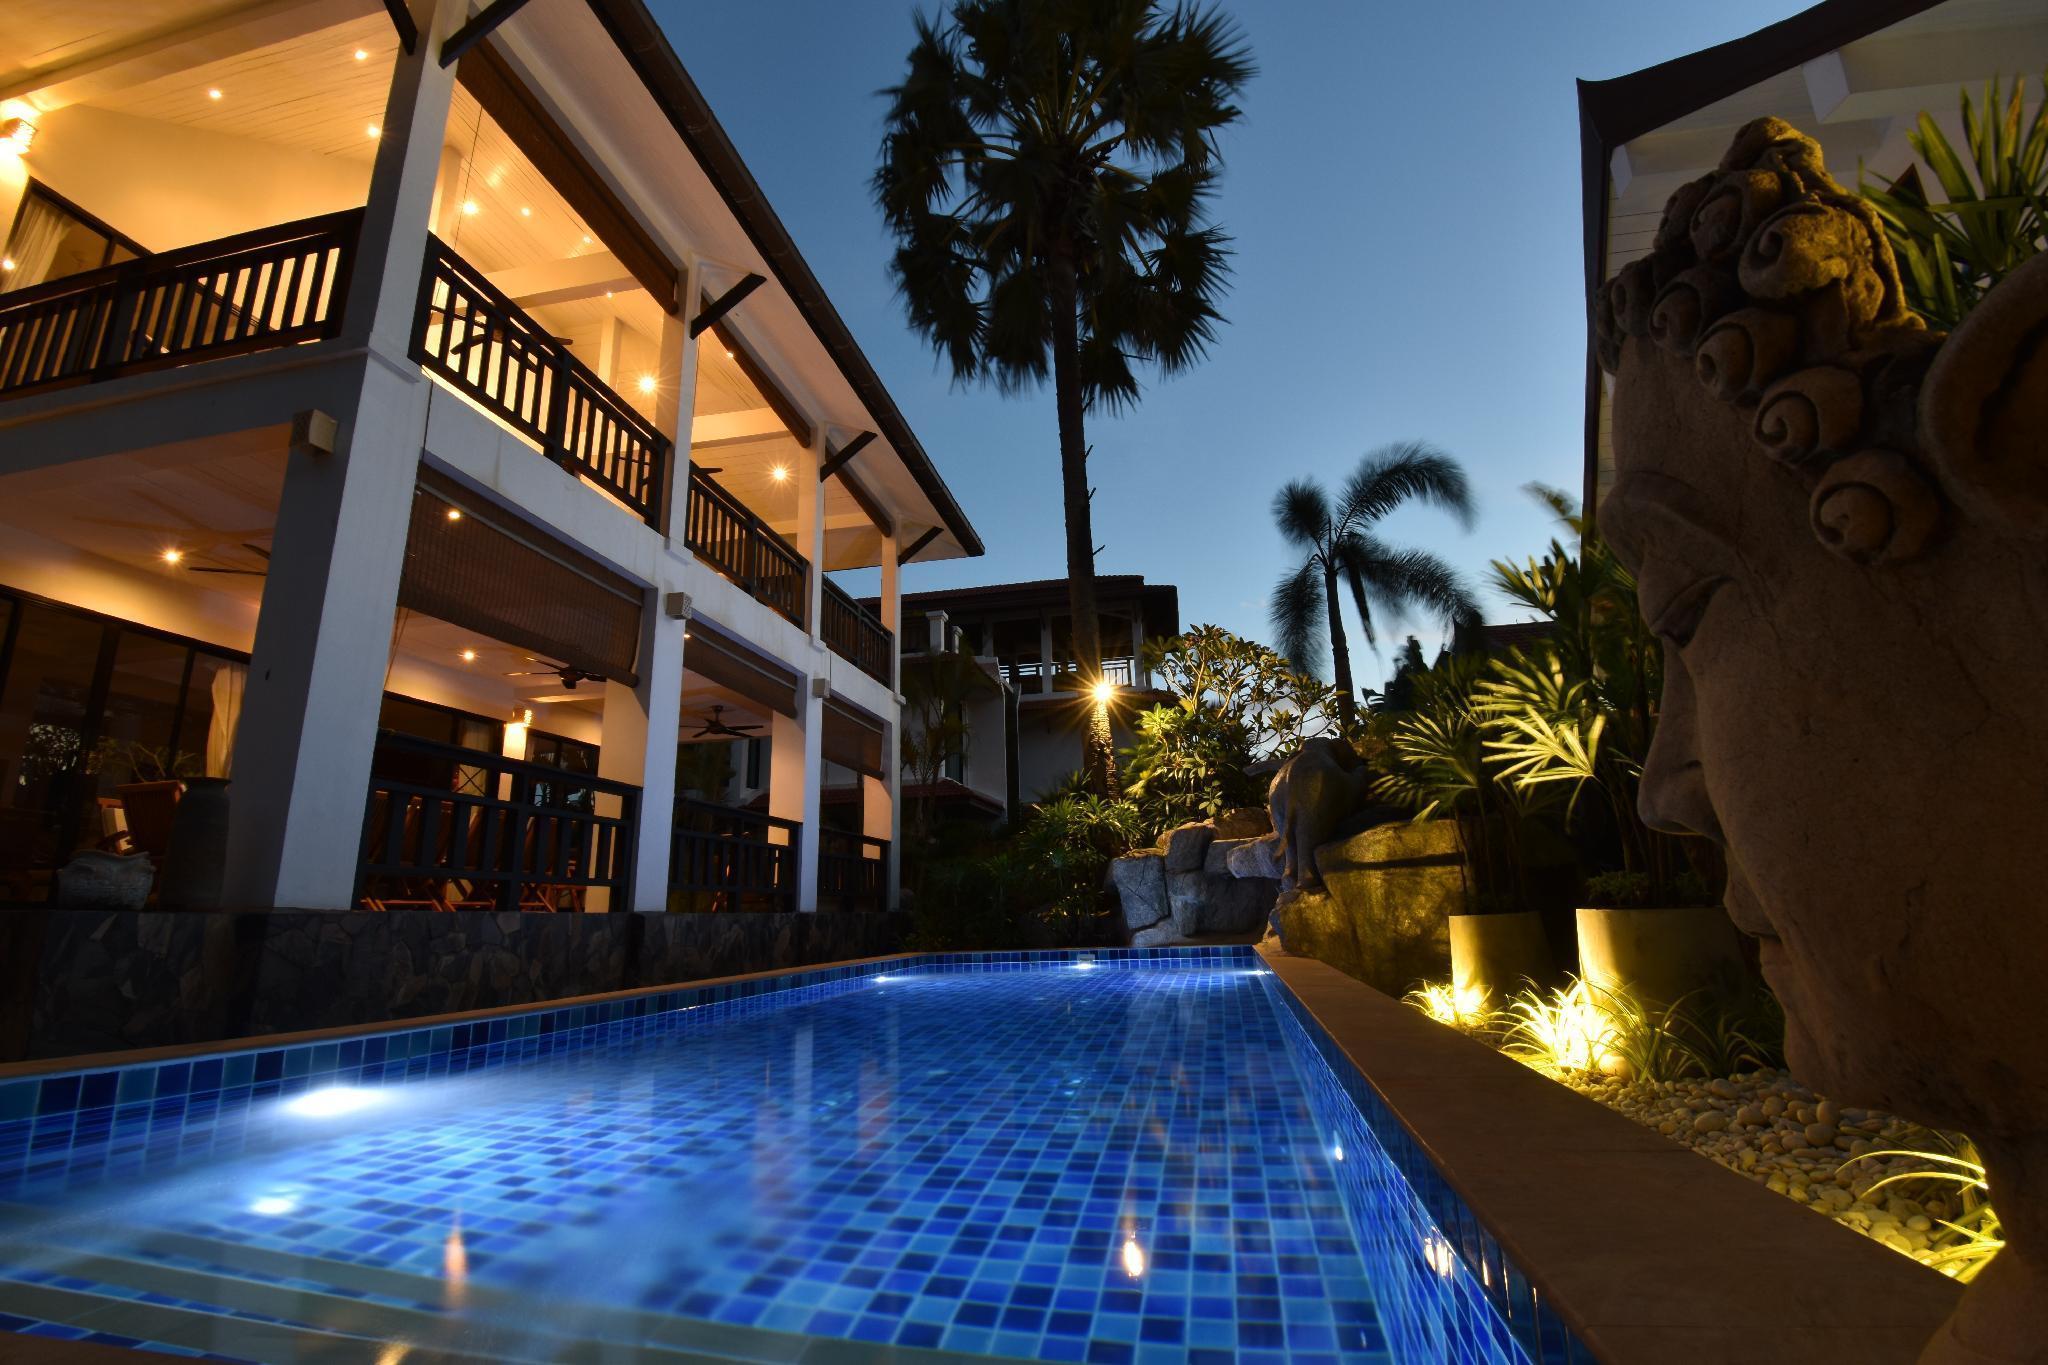 Spacious pool villa - Malee Beach Villa B4 วิลลา 4 ห้องนอน 3 ห้องน้ำส่วนตัว ขนาด 210 ตร.ม. – หาดพระแอะ